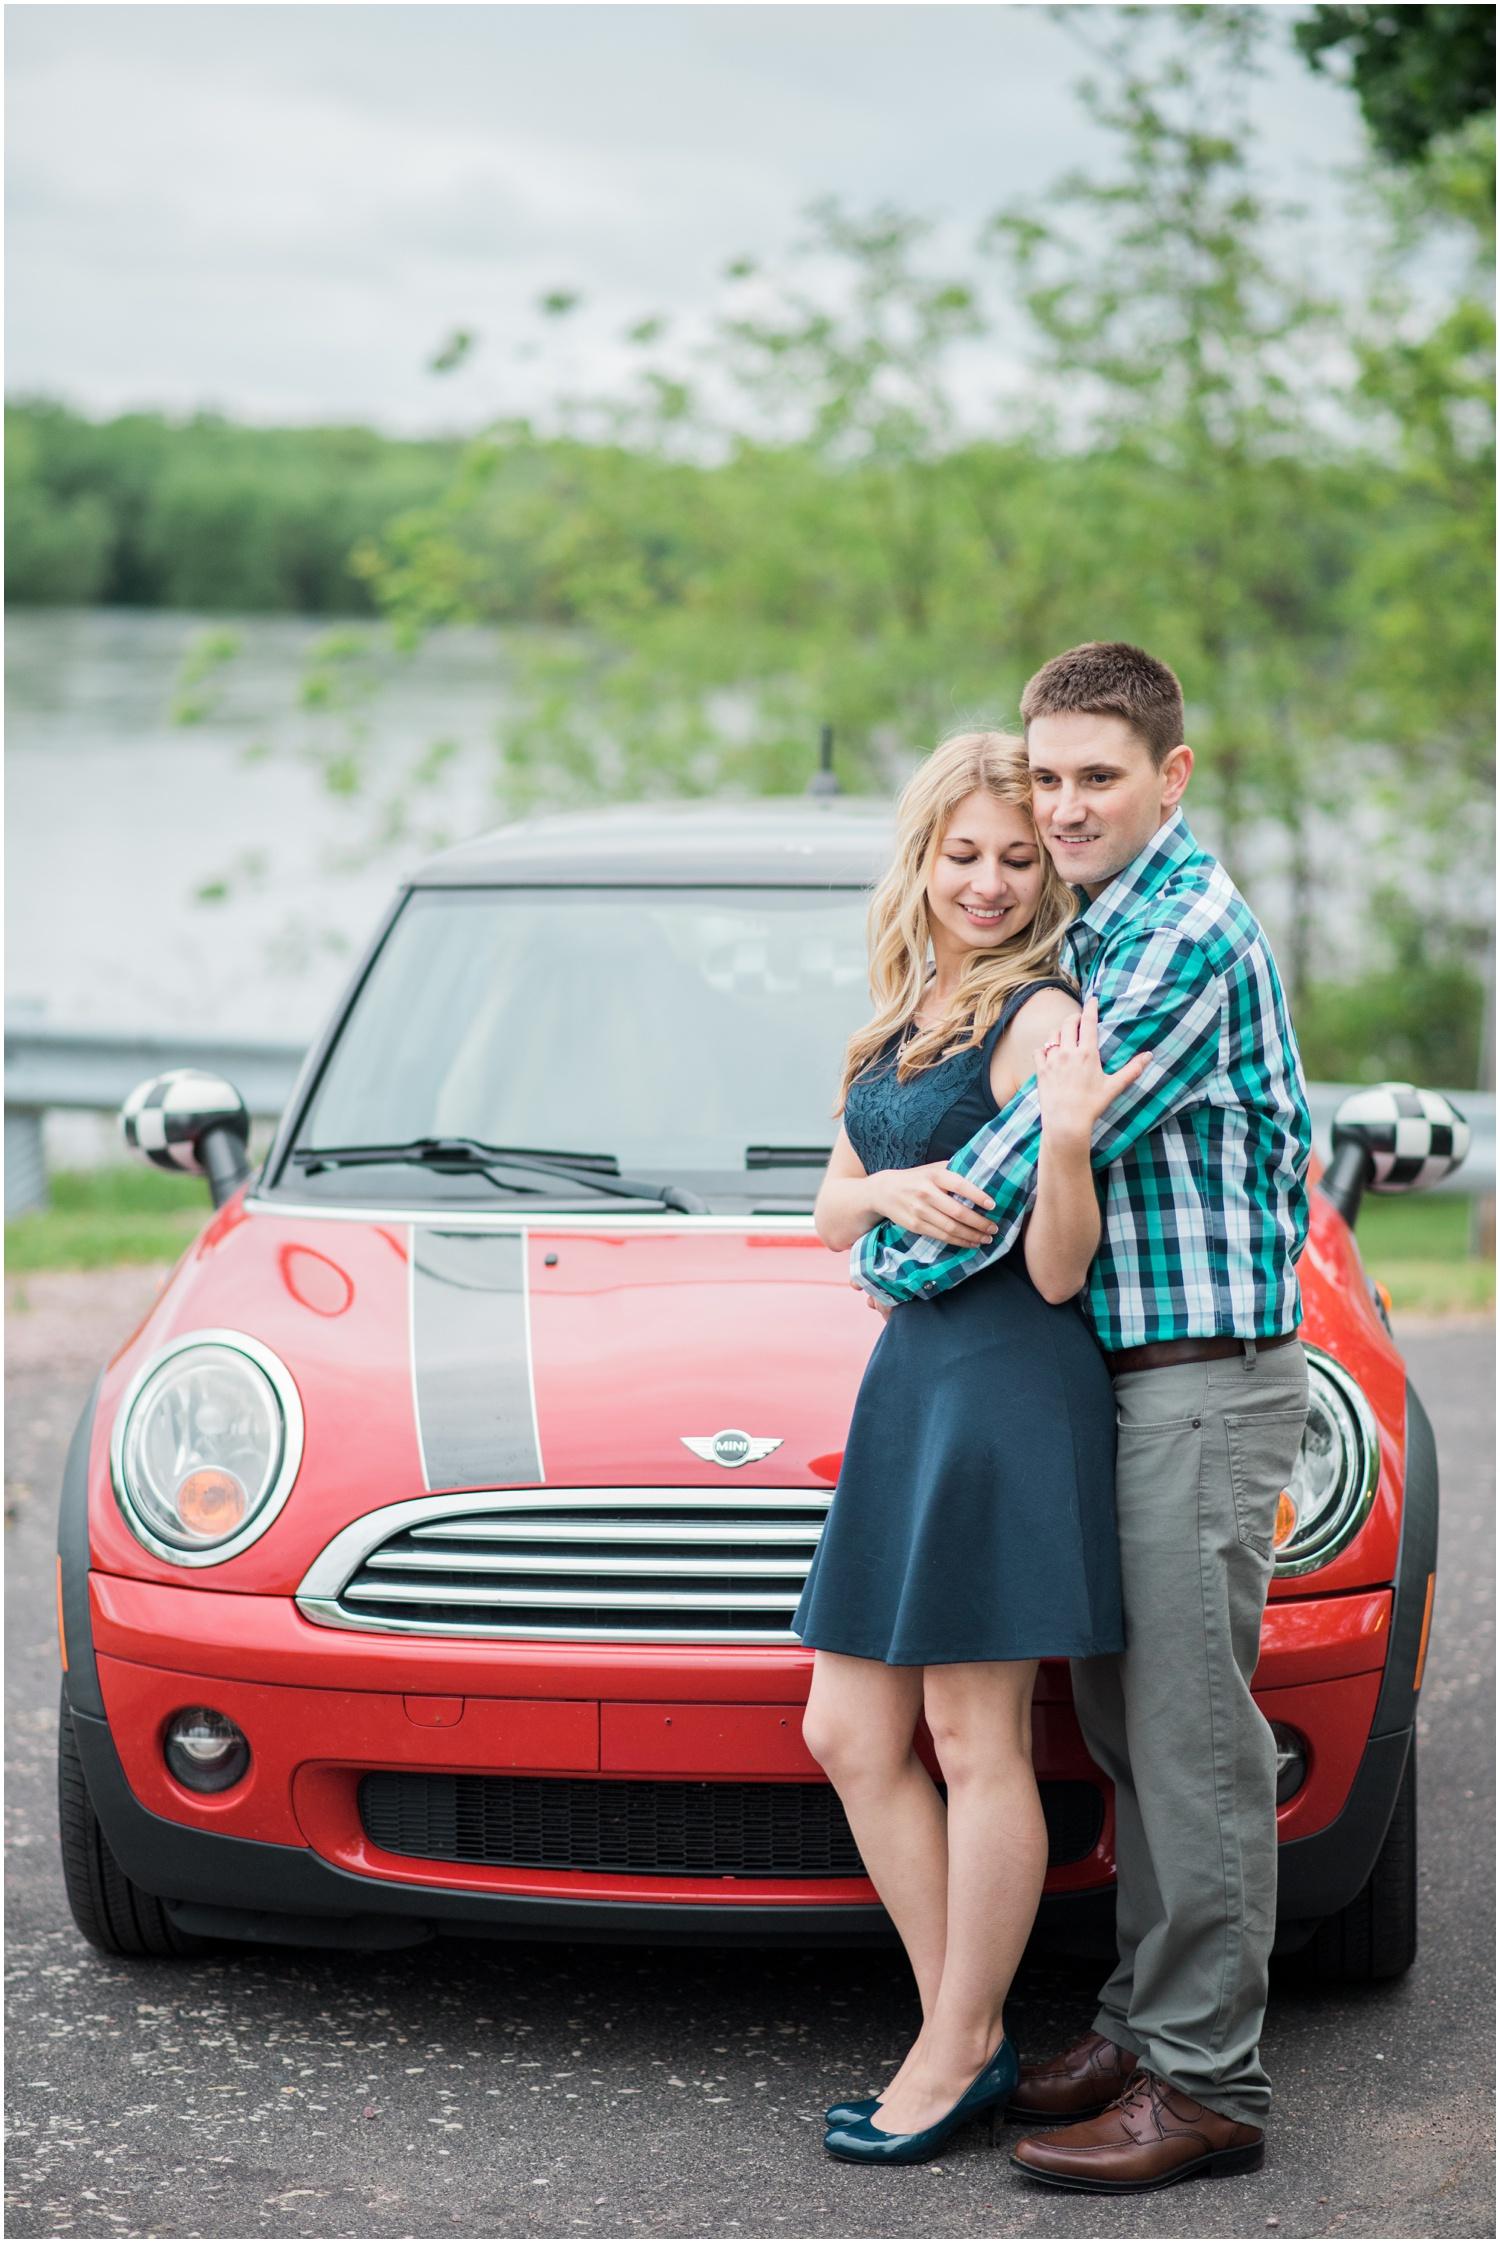 Paquette_Park_Portage_WI_Engagement_Photos_Heather_and_Derek_0034.jpg